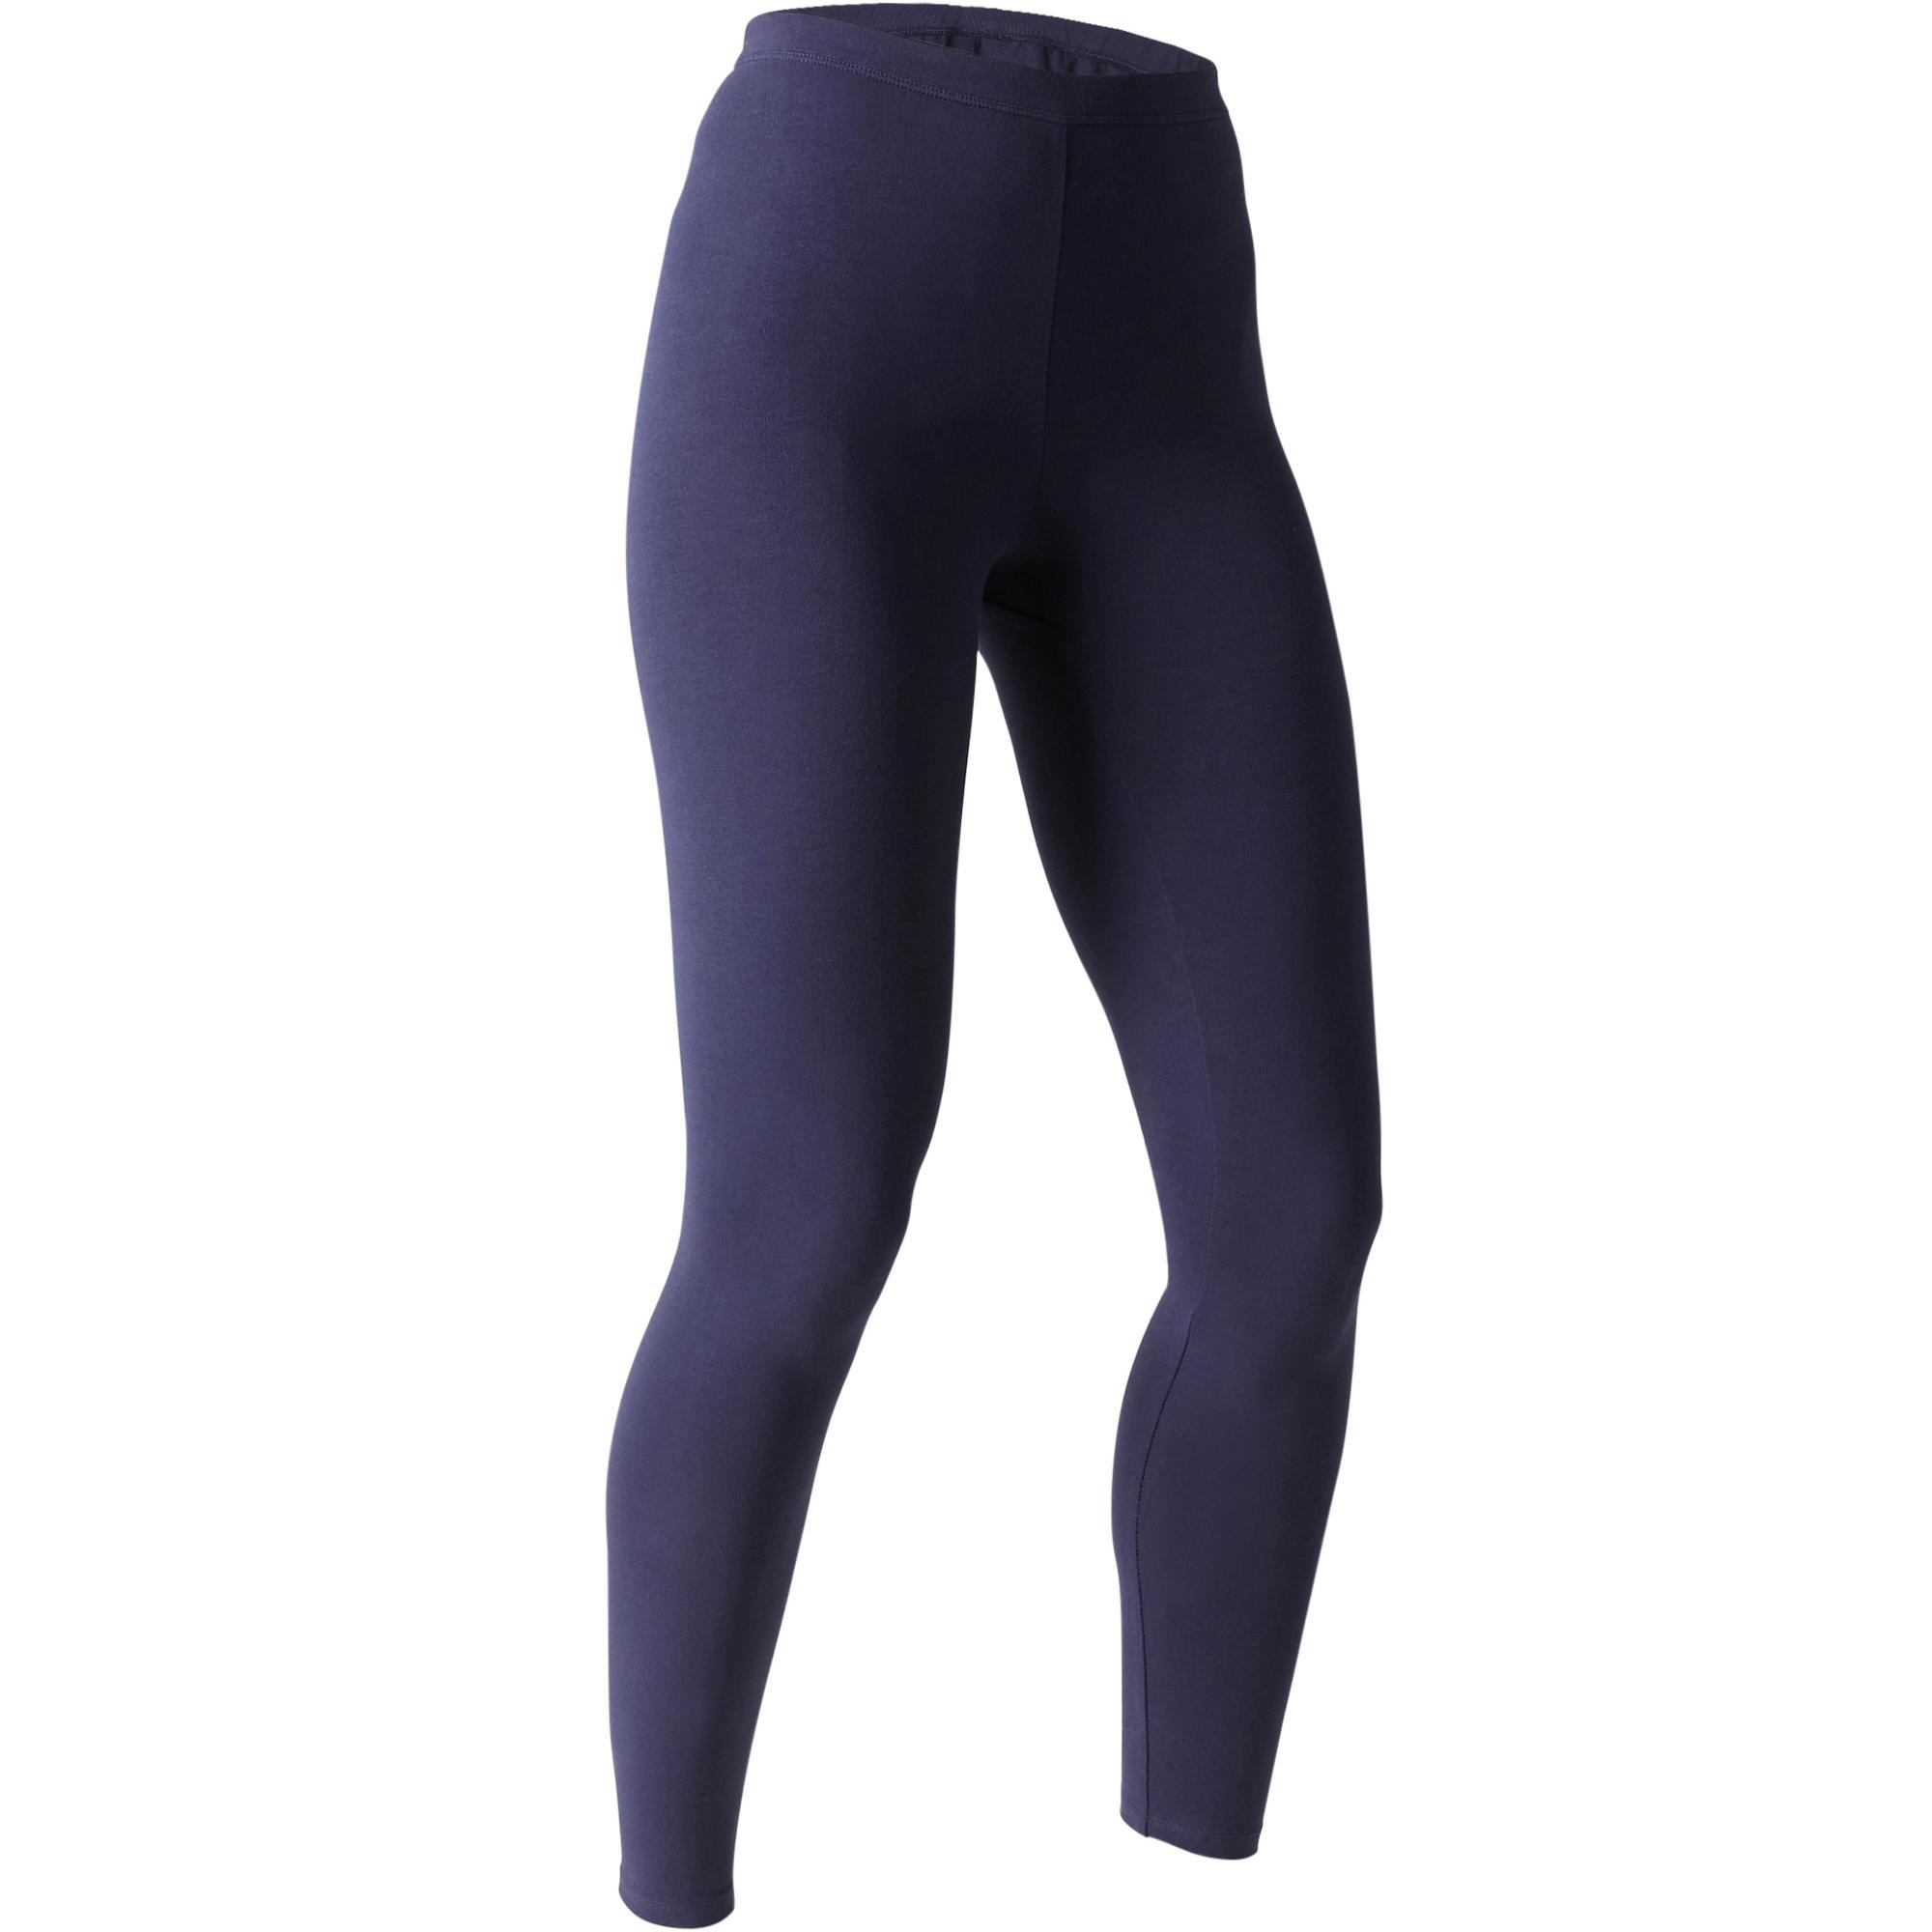 legging sport bleu marine femme